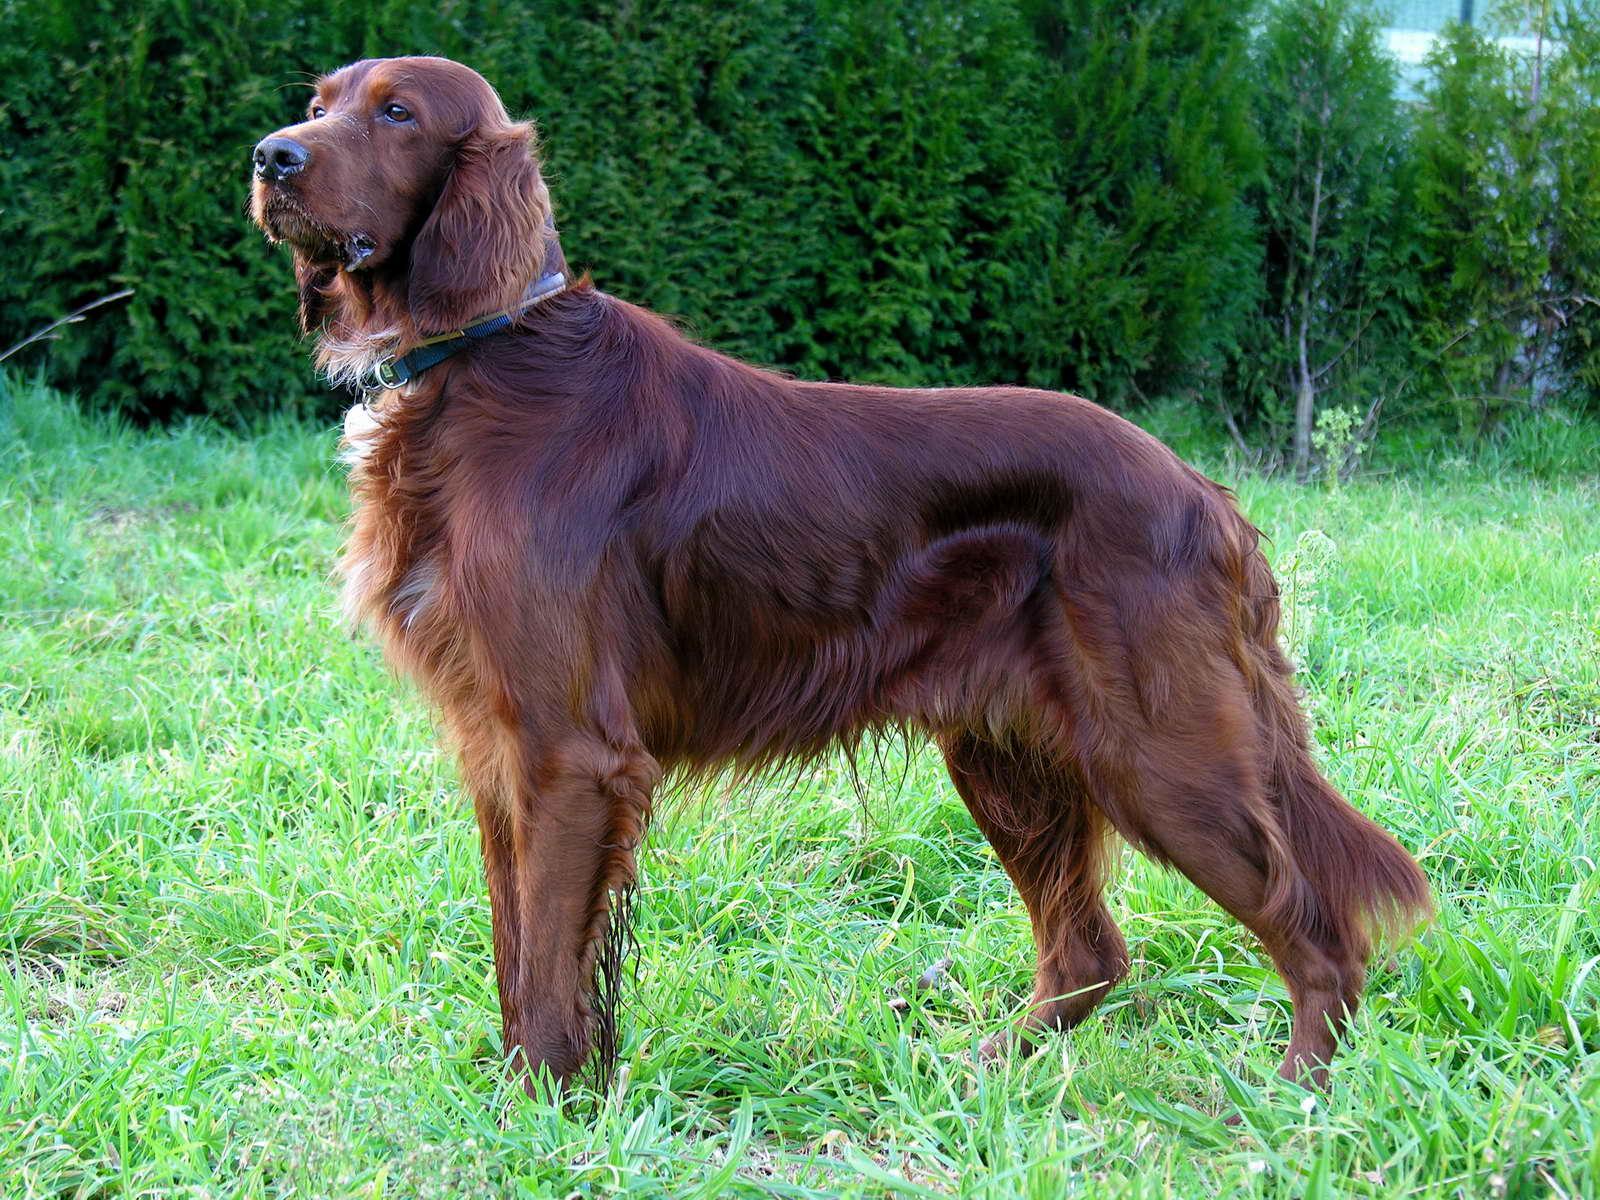 Irish Setter dog on the grass wallpaper